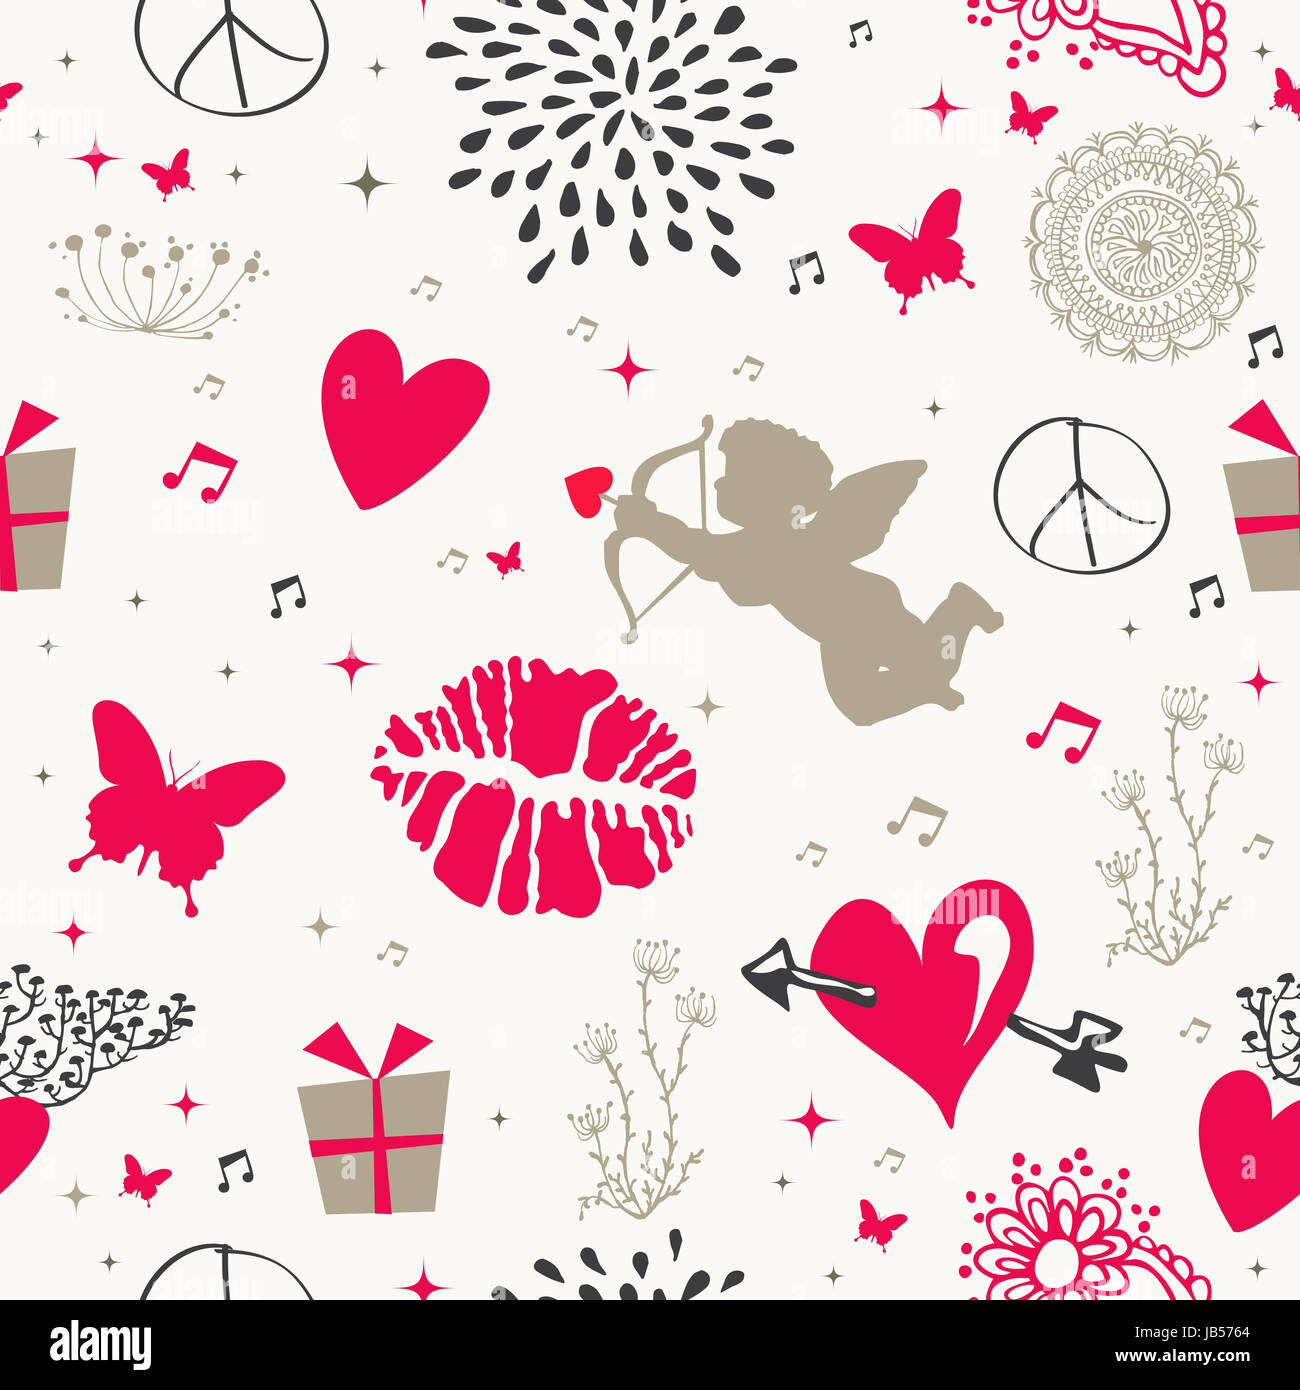 Retro Valentines Day Elements Seamless Pattern Background Eps10